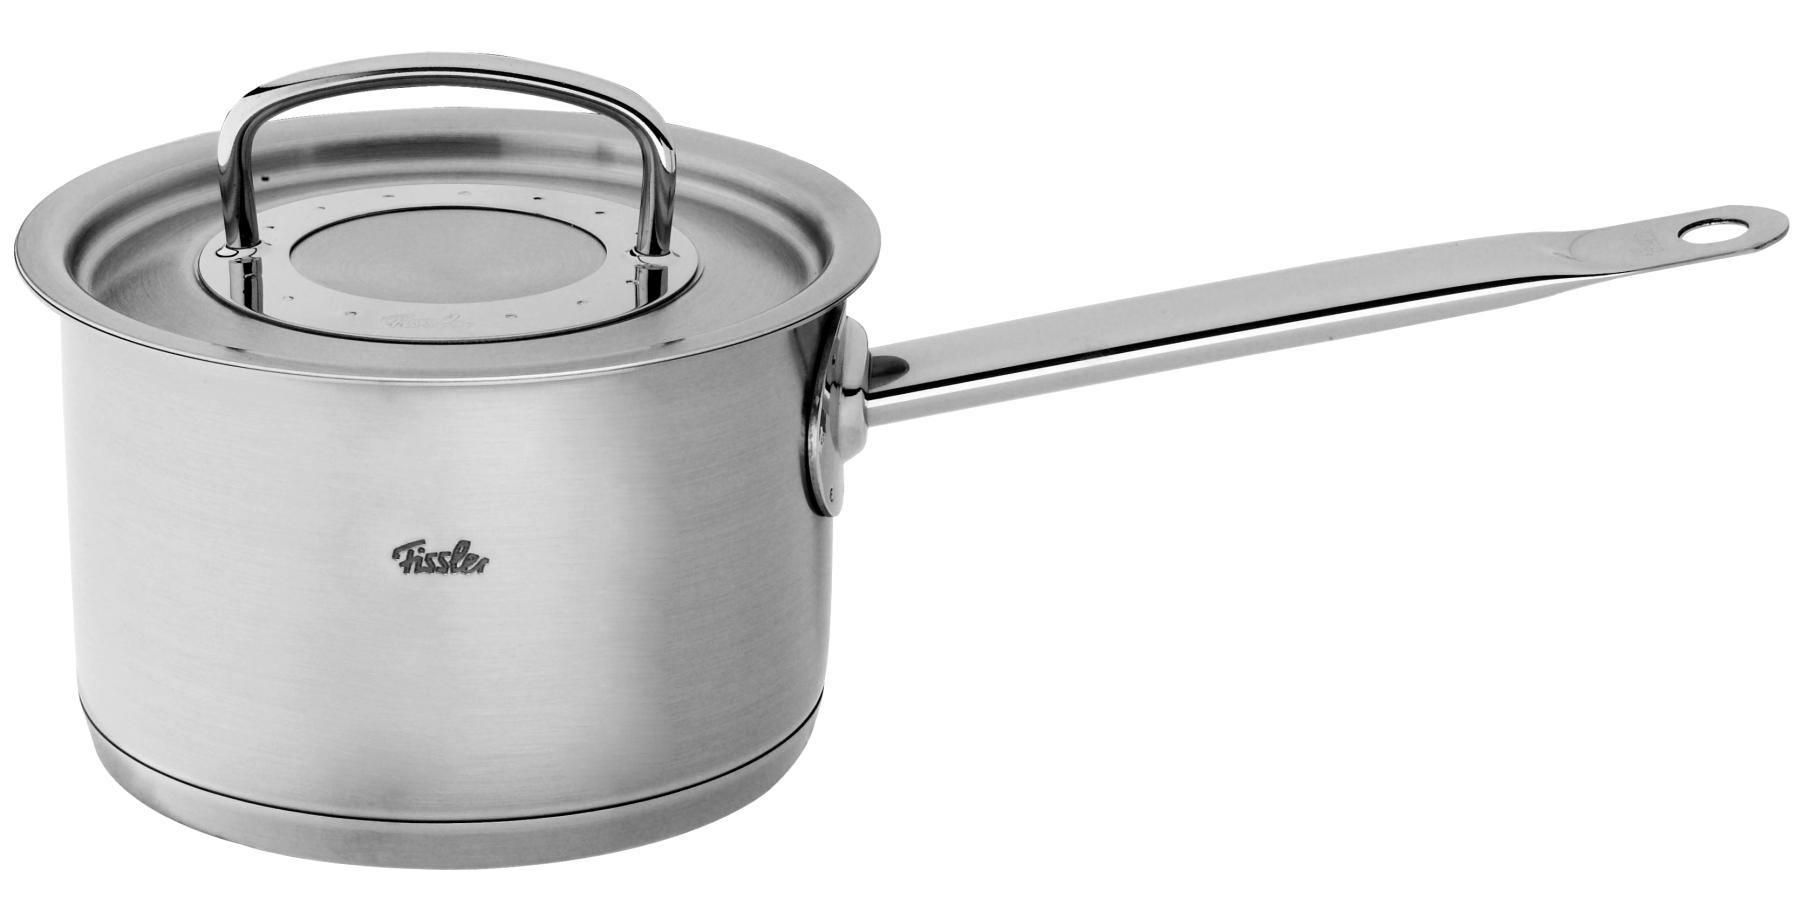 Fissler Original Pro Collection Stainless Steel High Sauce Pan, 2.1 Quart